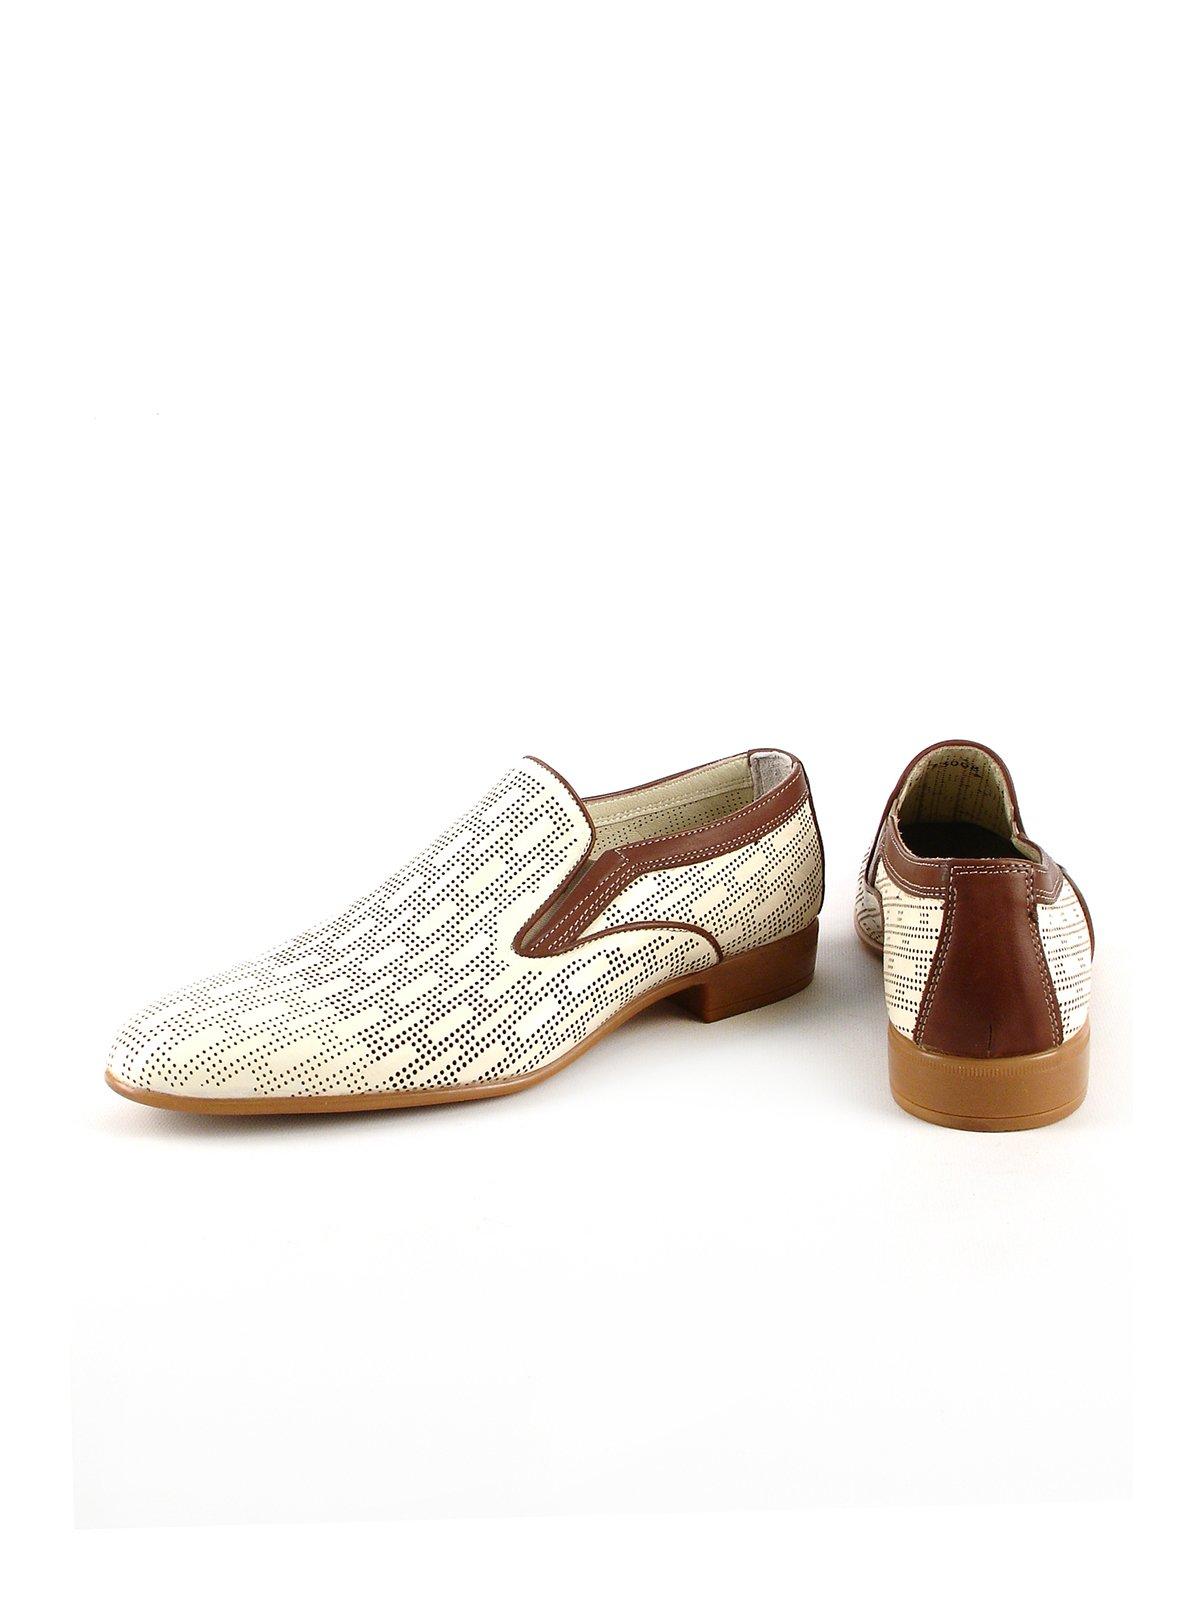 Туфли бежевые | 2816880 | фото 3